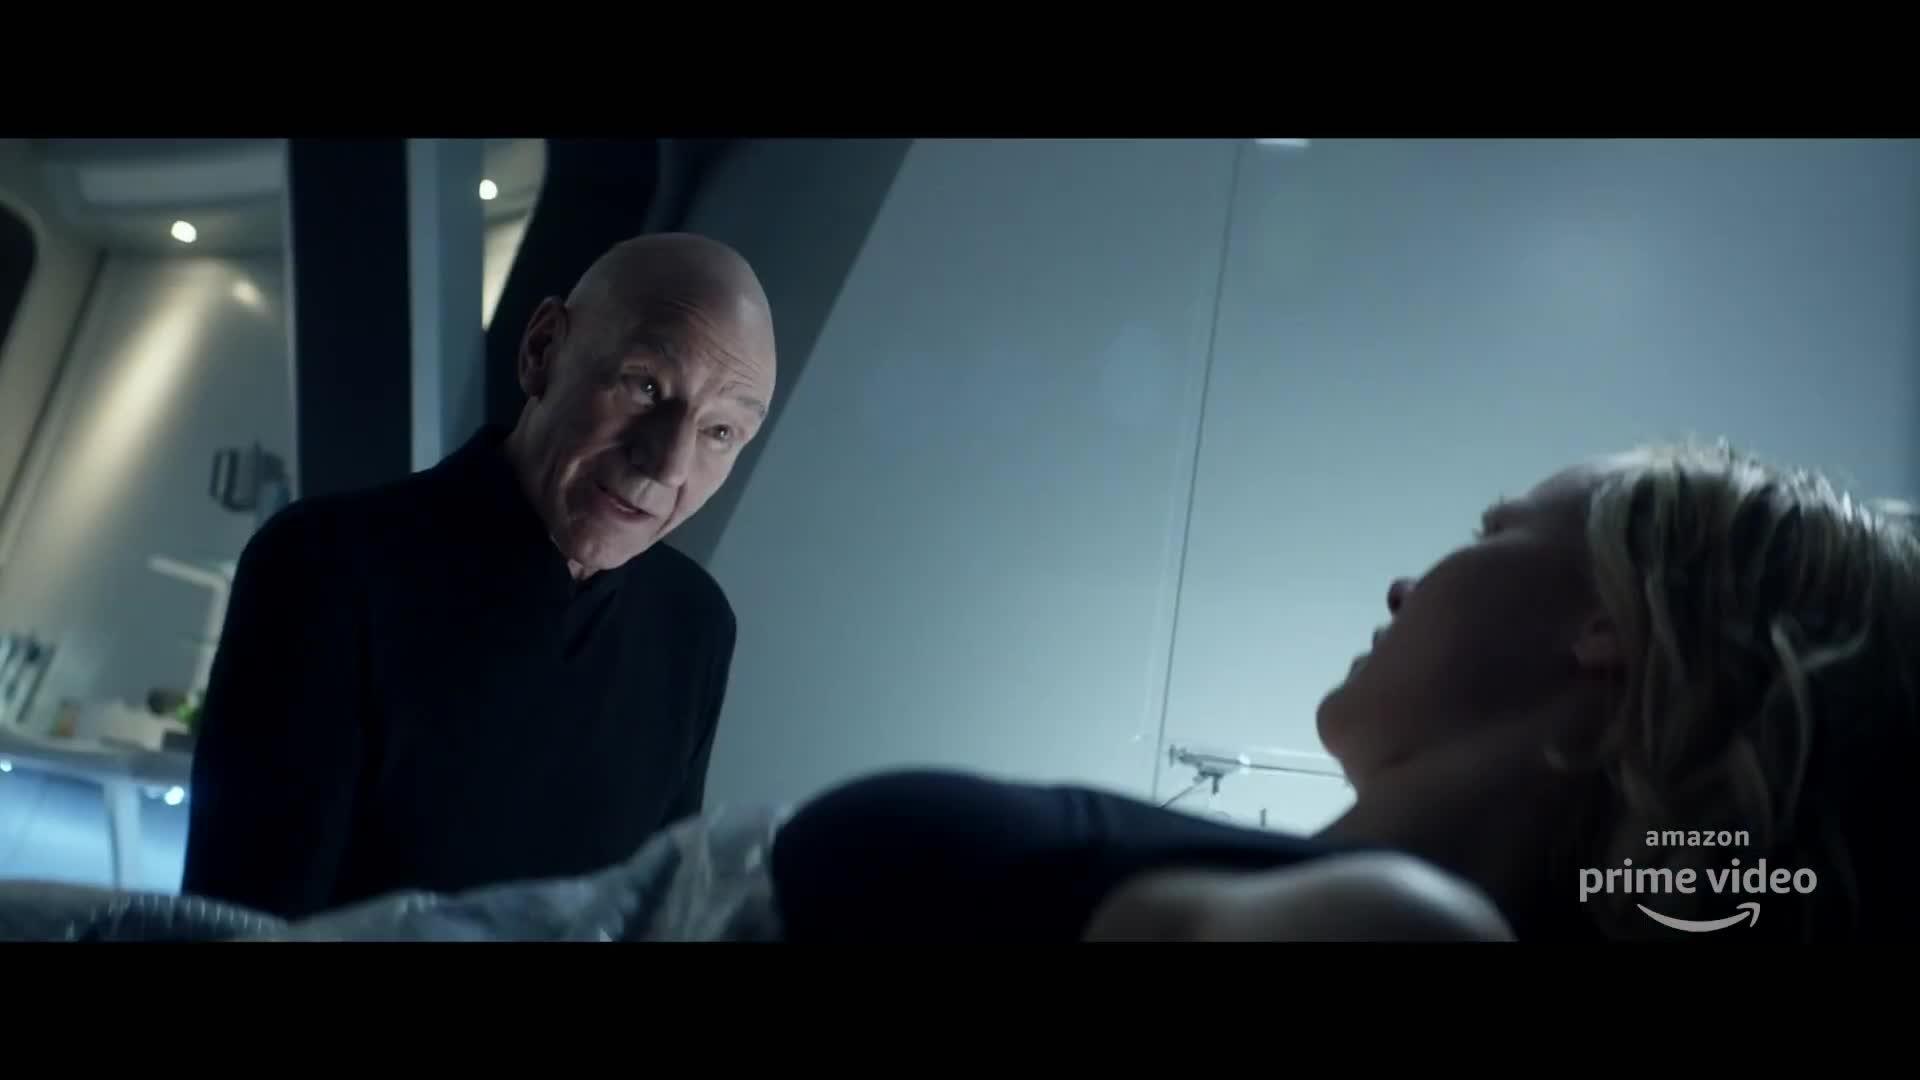 Trailer, Amazon, Serie, Amazon Prime, Teaser, Amazon Prime Video, Star Trek, Prime Video, Jean Luc Picard, Picard, Star Trek Picard, Star Trek:Picard, Star Trek: Picard